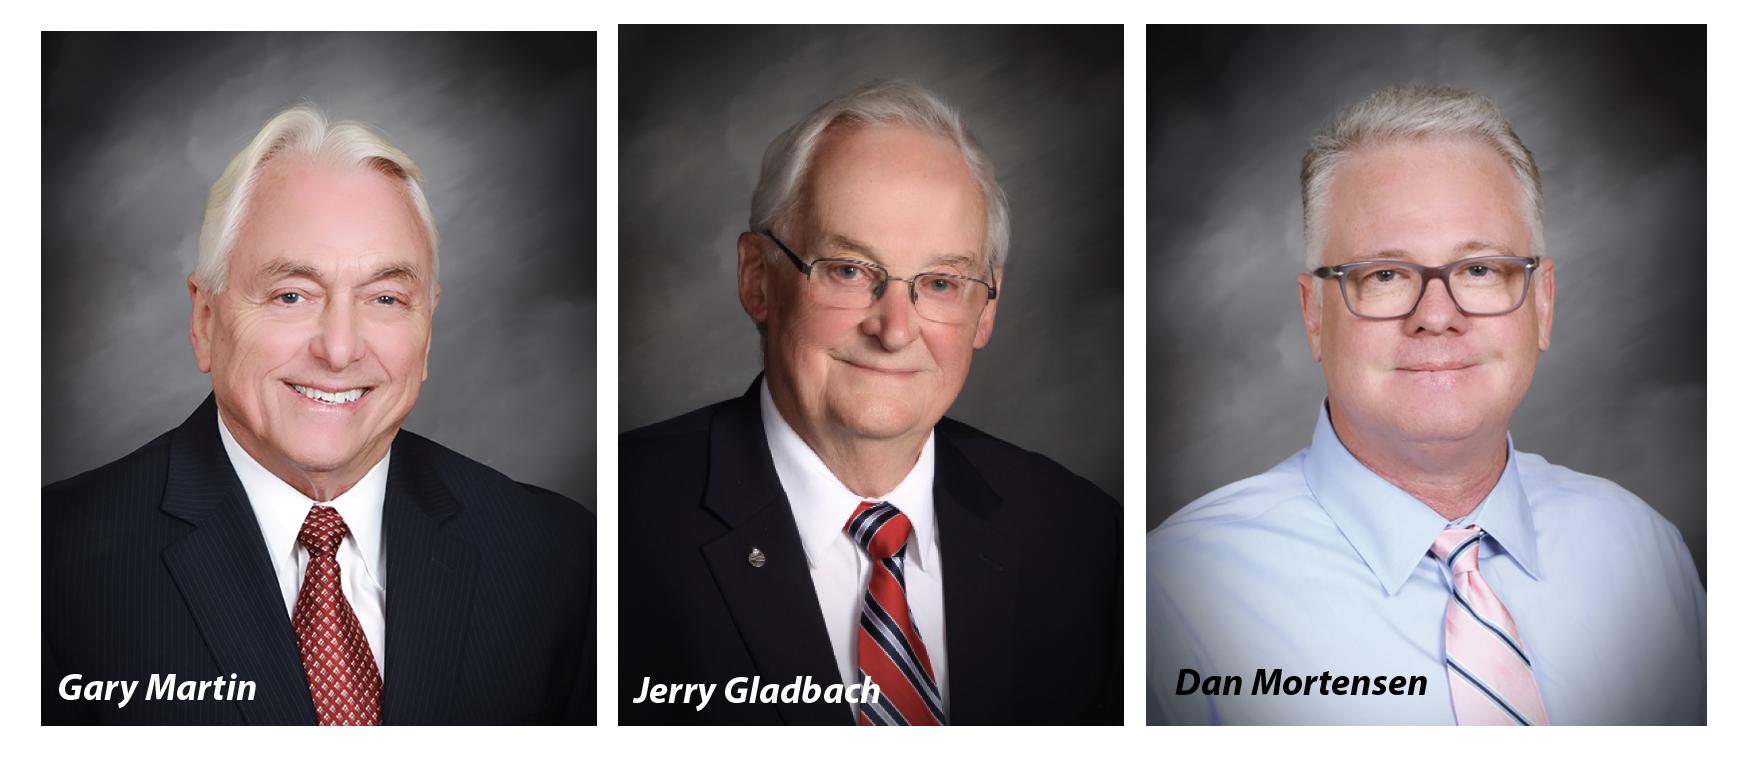 SCV Water Seats 2021 Board Leadership Gary Martin Re-Elected as Board President Jerry Gladbach and Dan Mortensen to Serve as Vice Presidents - Magazine of Santa Clarita